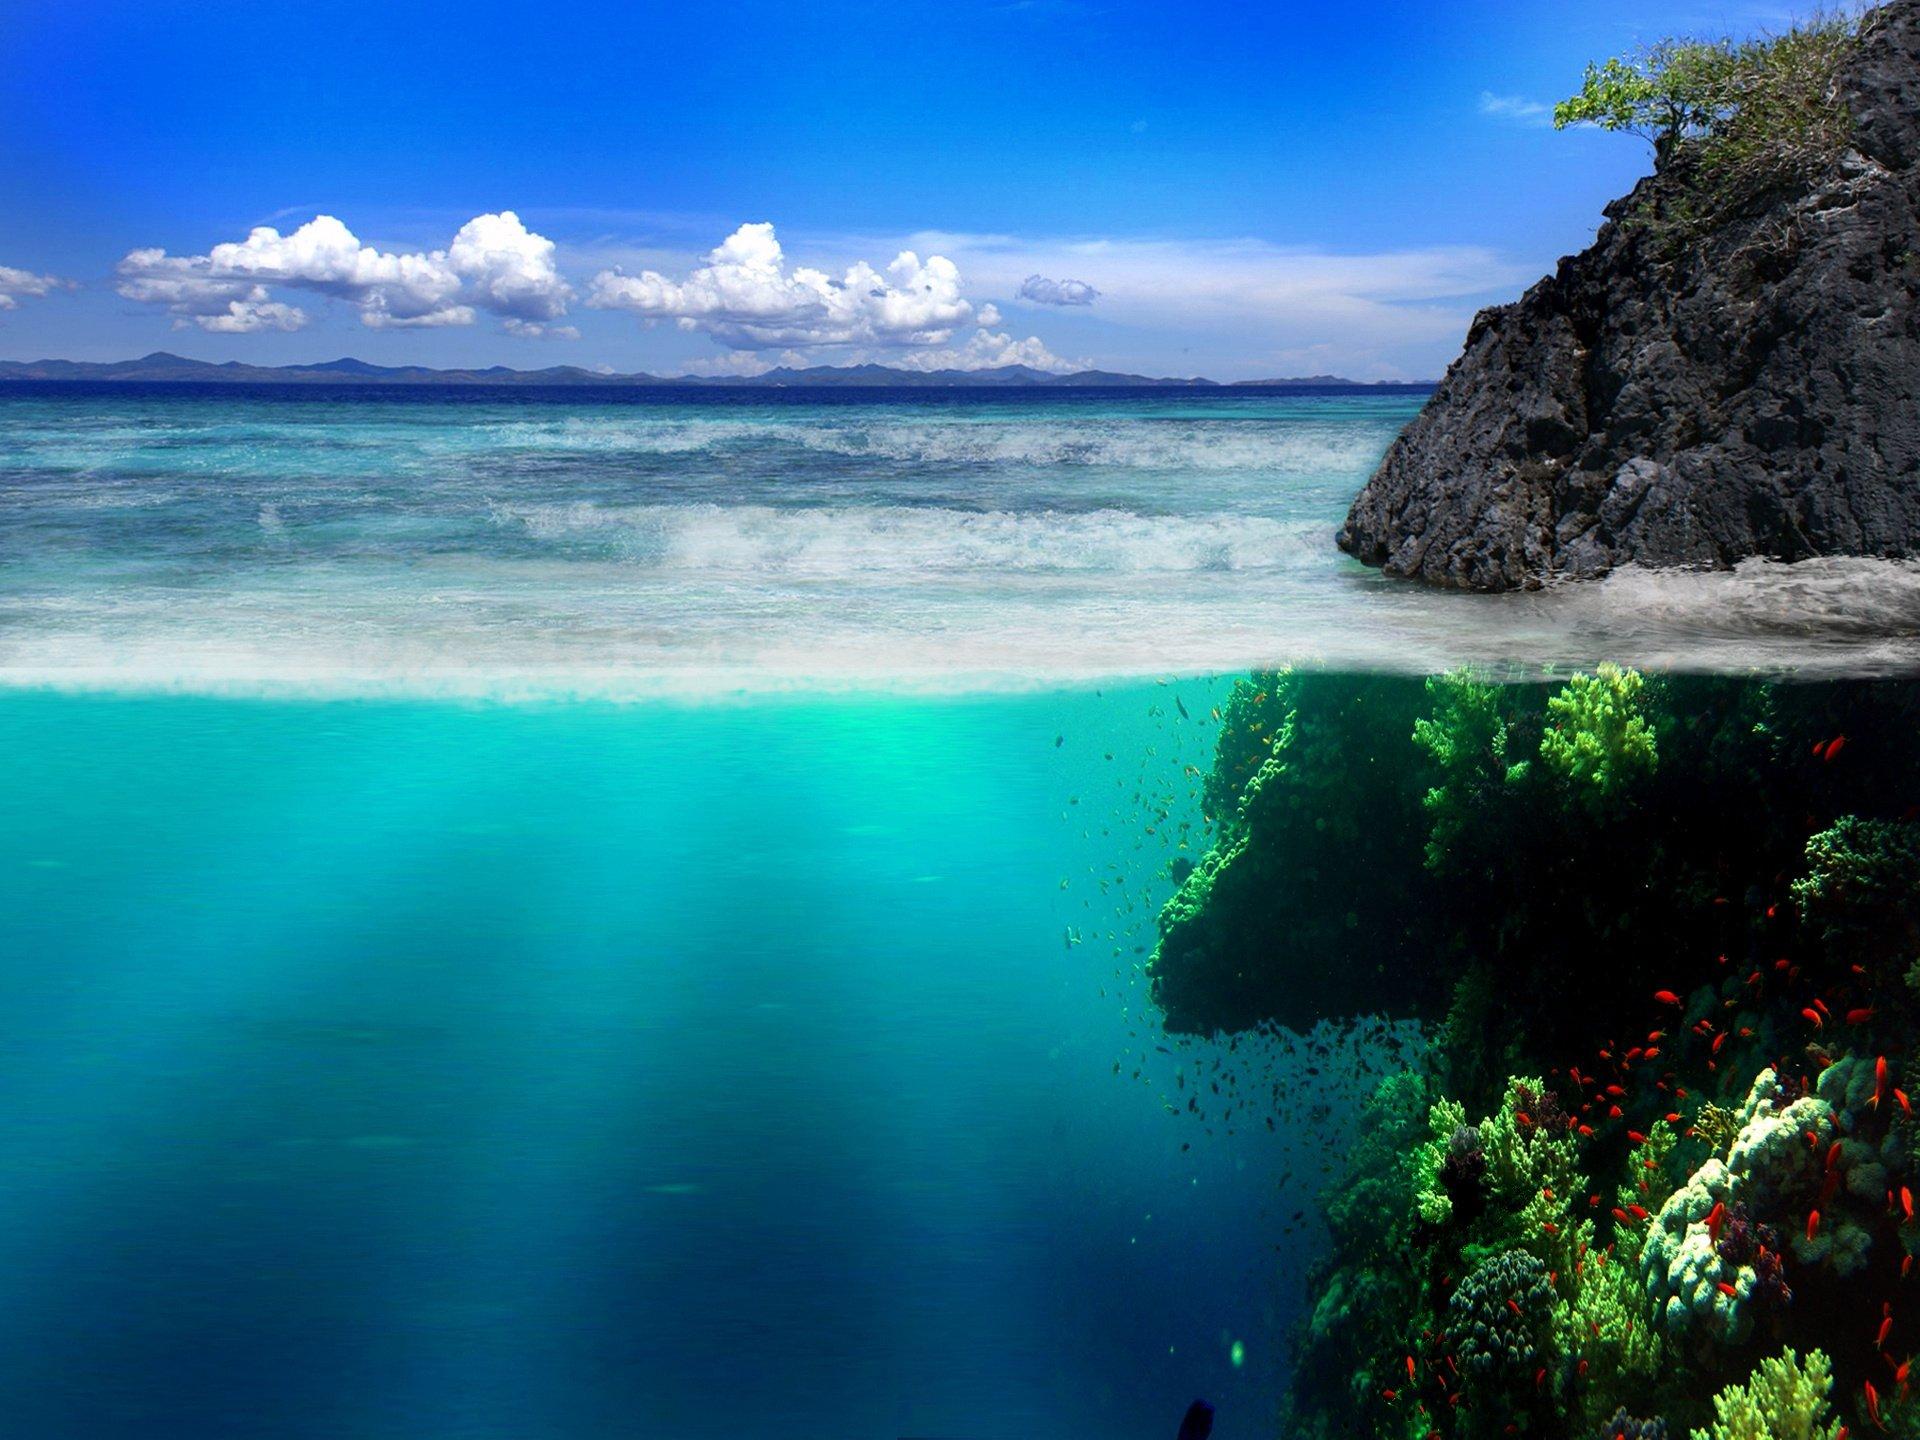 море обои на айфон 7, подводный мир, берег, скалы